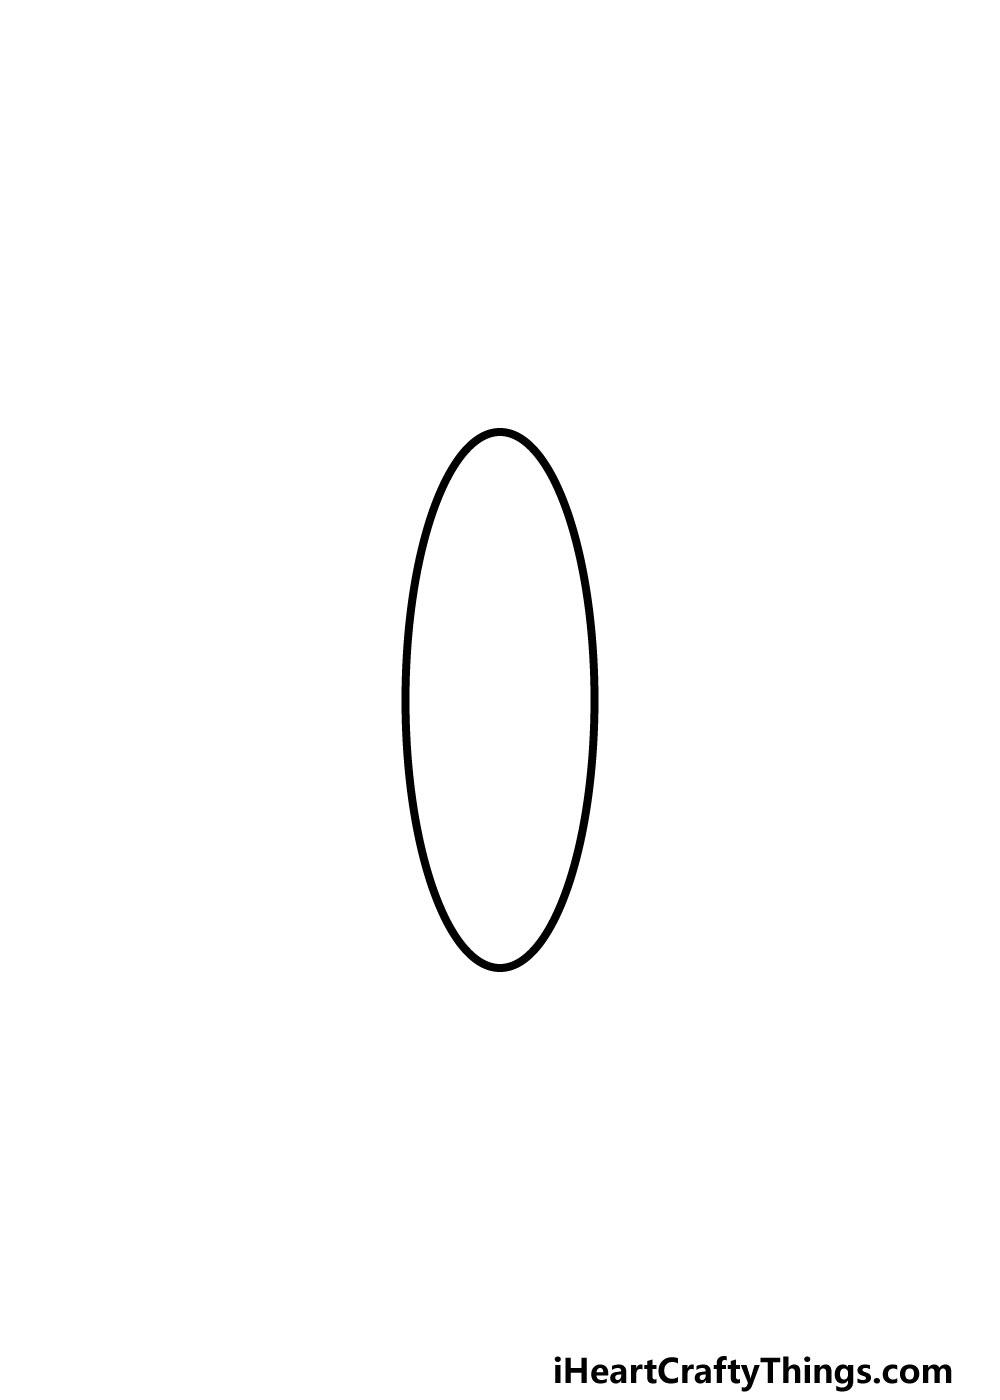 drawing an atom step 1